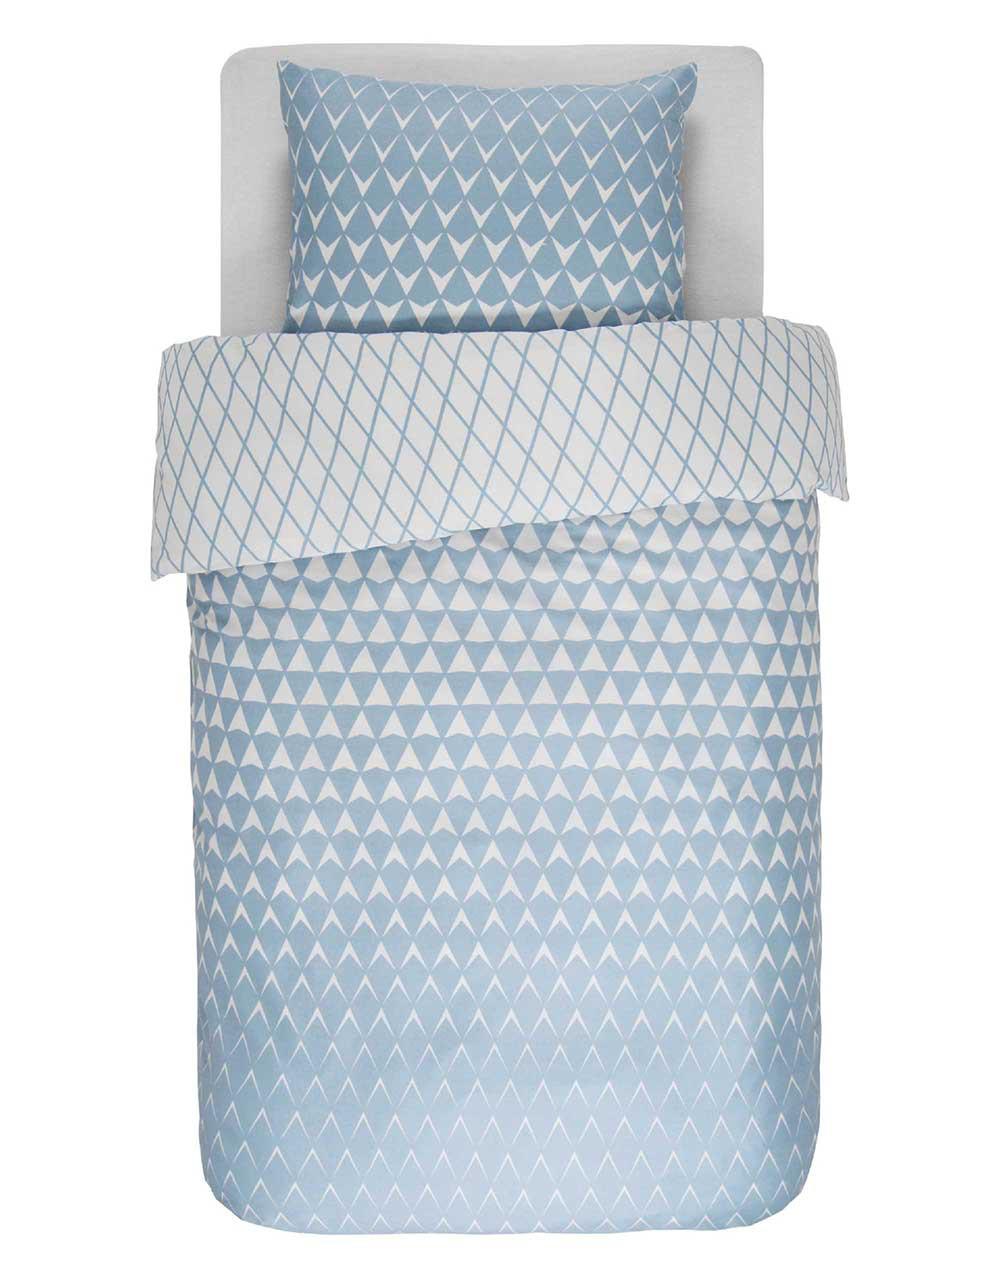 Picture of: Sengetoj 200×220 Cm Luksus Dobbelt Sengetoj Fra Esprit Mina Blue 2×2 2